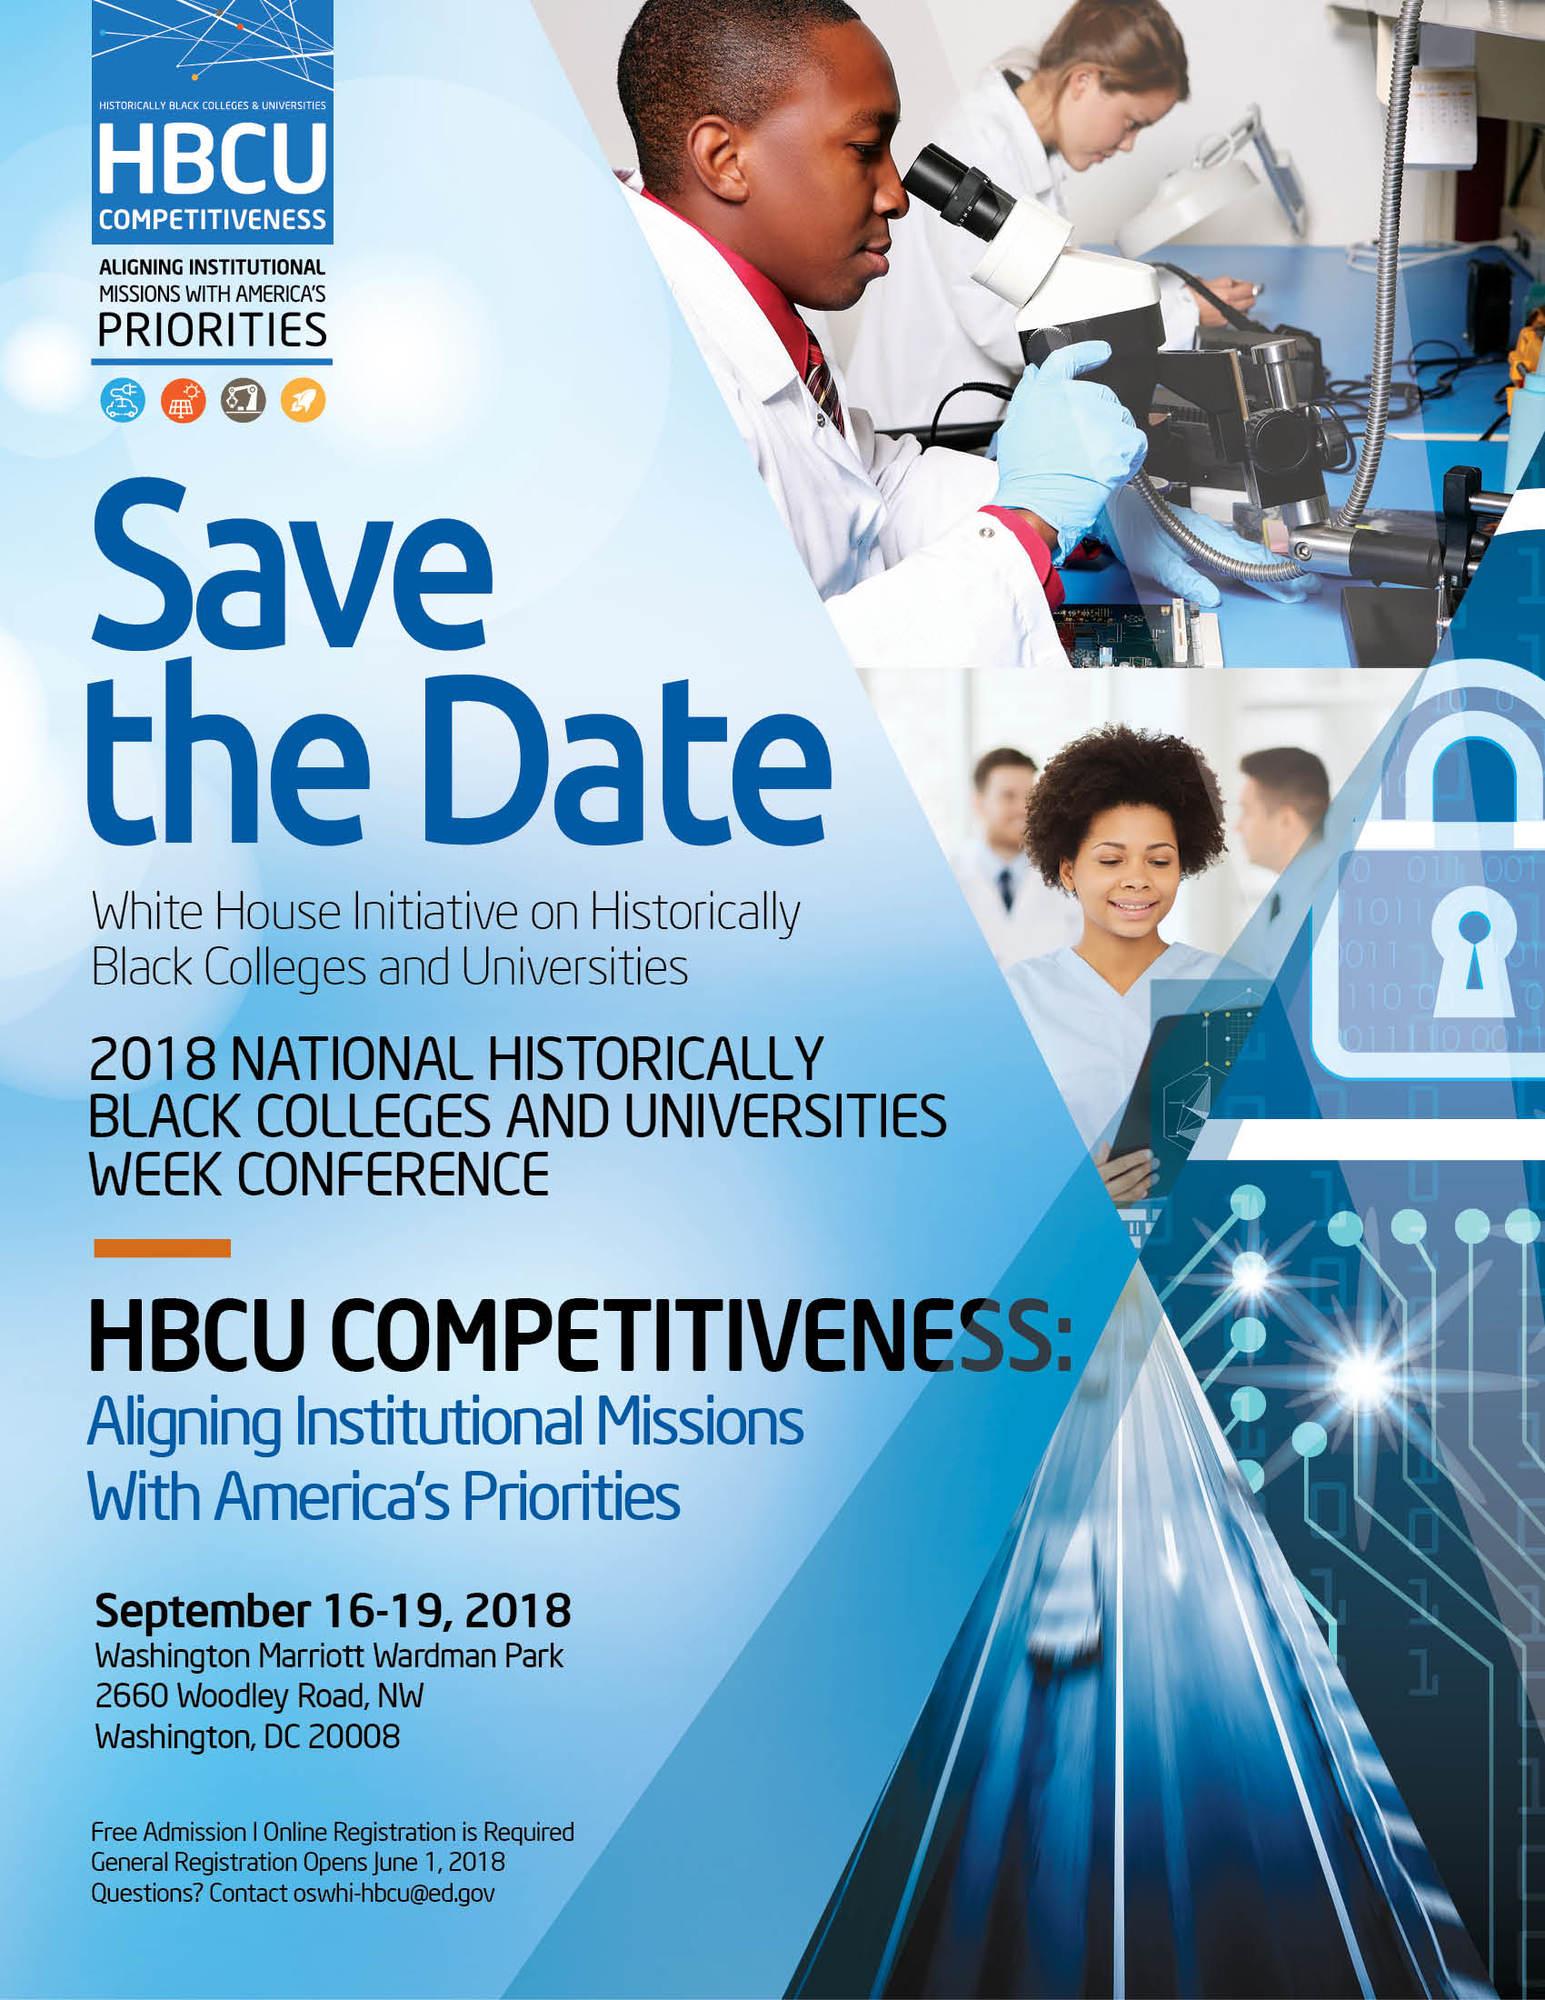 2018 HBCU Week Conference